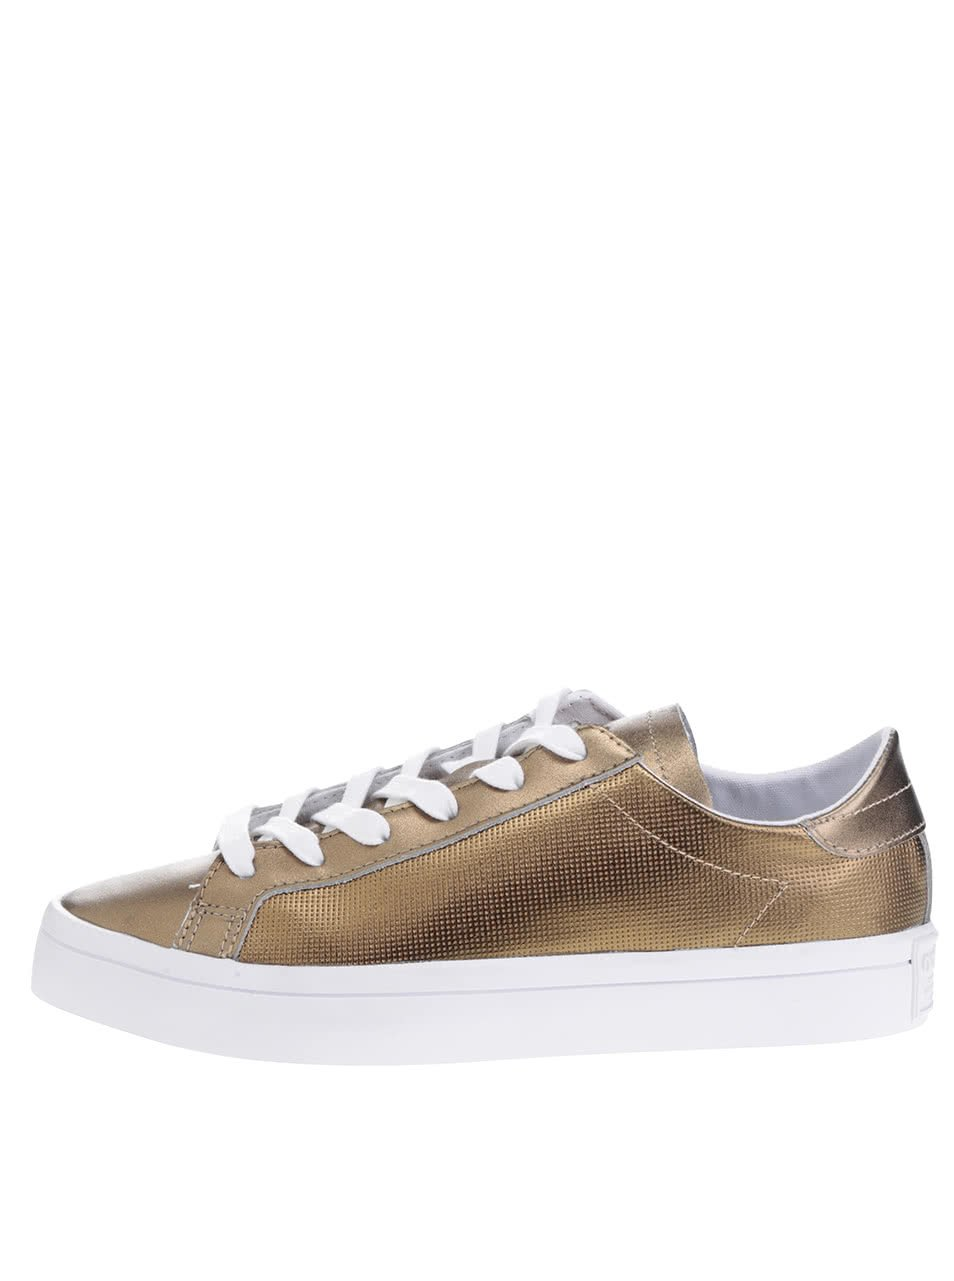 Dámské kožené tenisky ve zlaté barvě adidas Originals Courtvantage